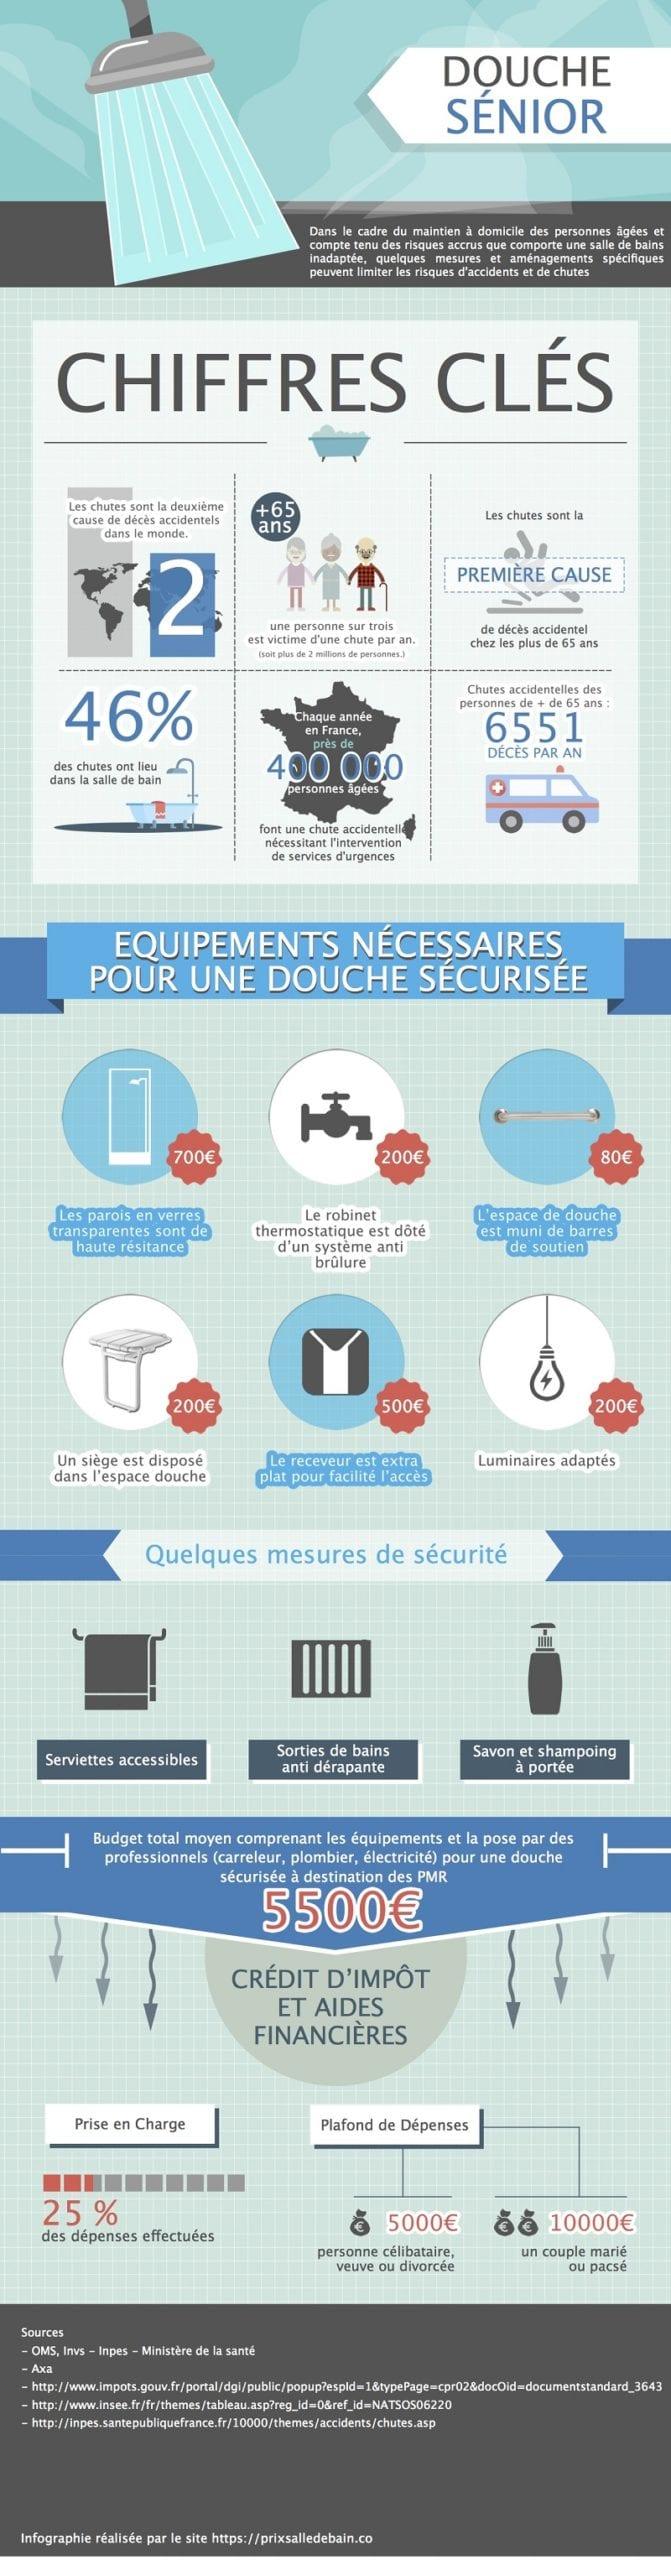 infographie-douche-senior